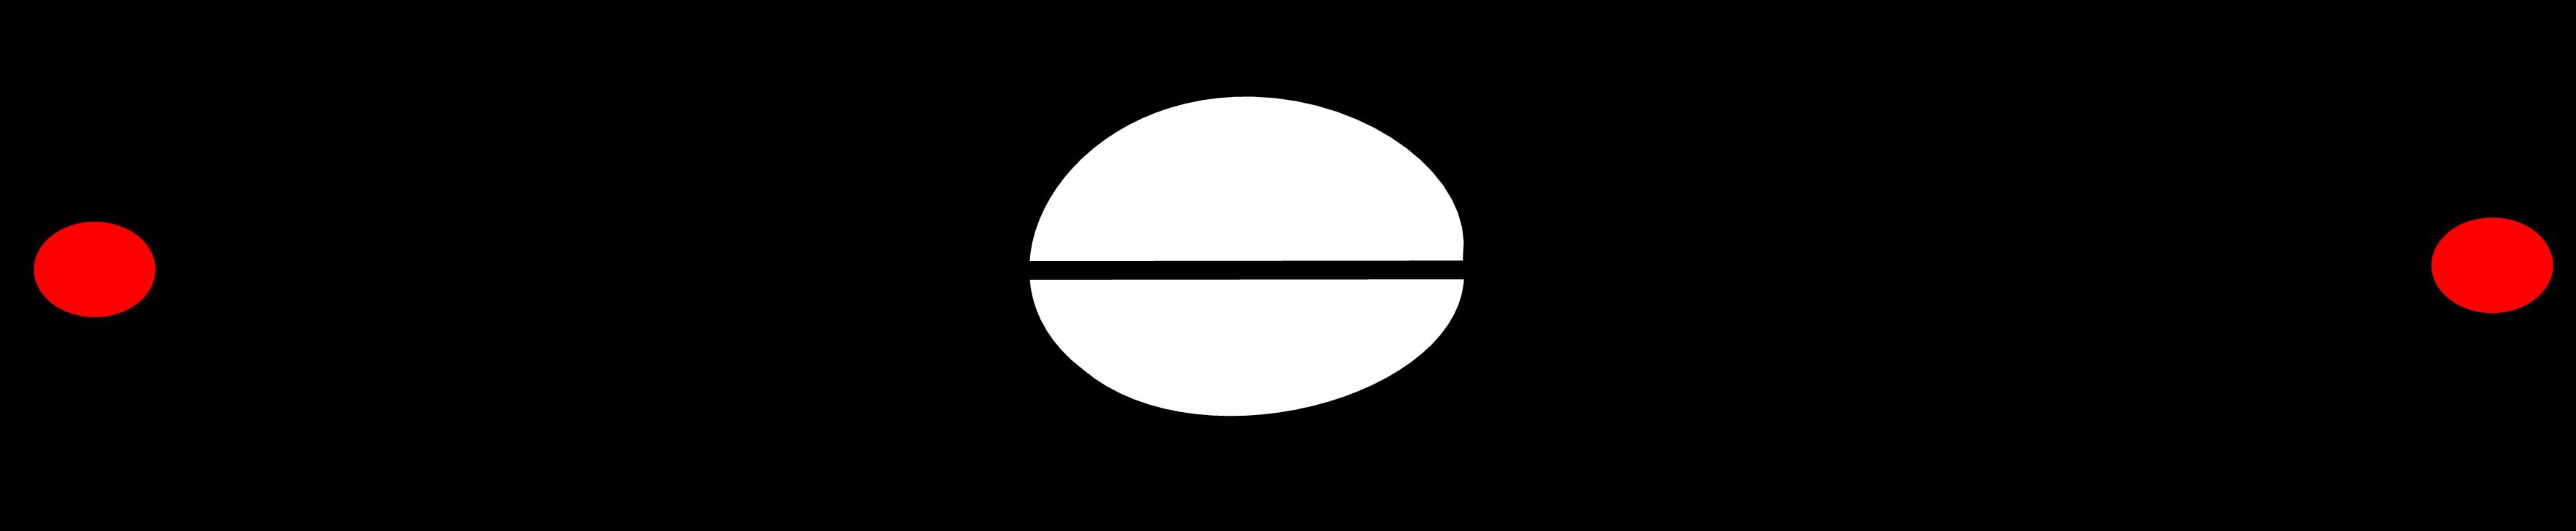 n1785912